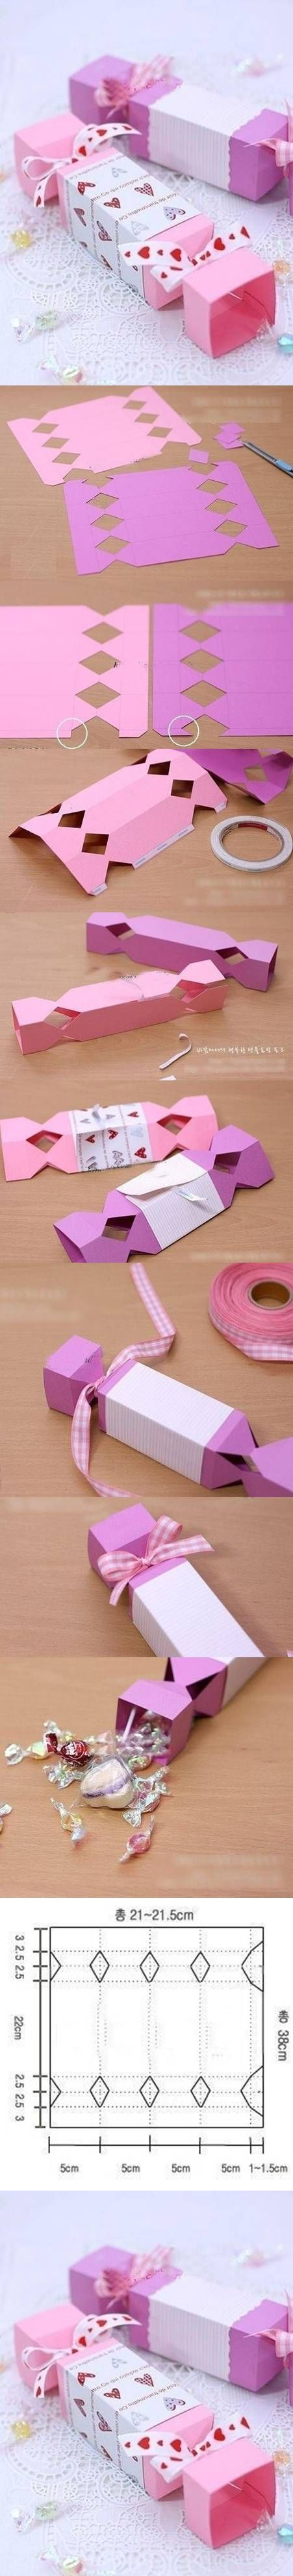 DIY Cute Candy Gift Box DIY Projects   UsefulDIY.com